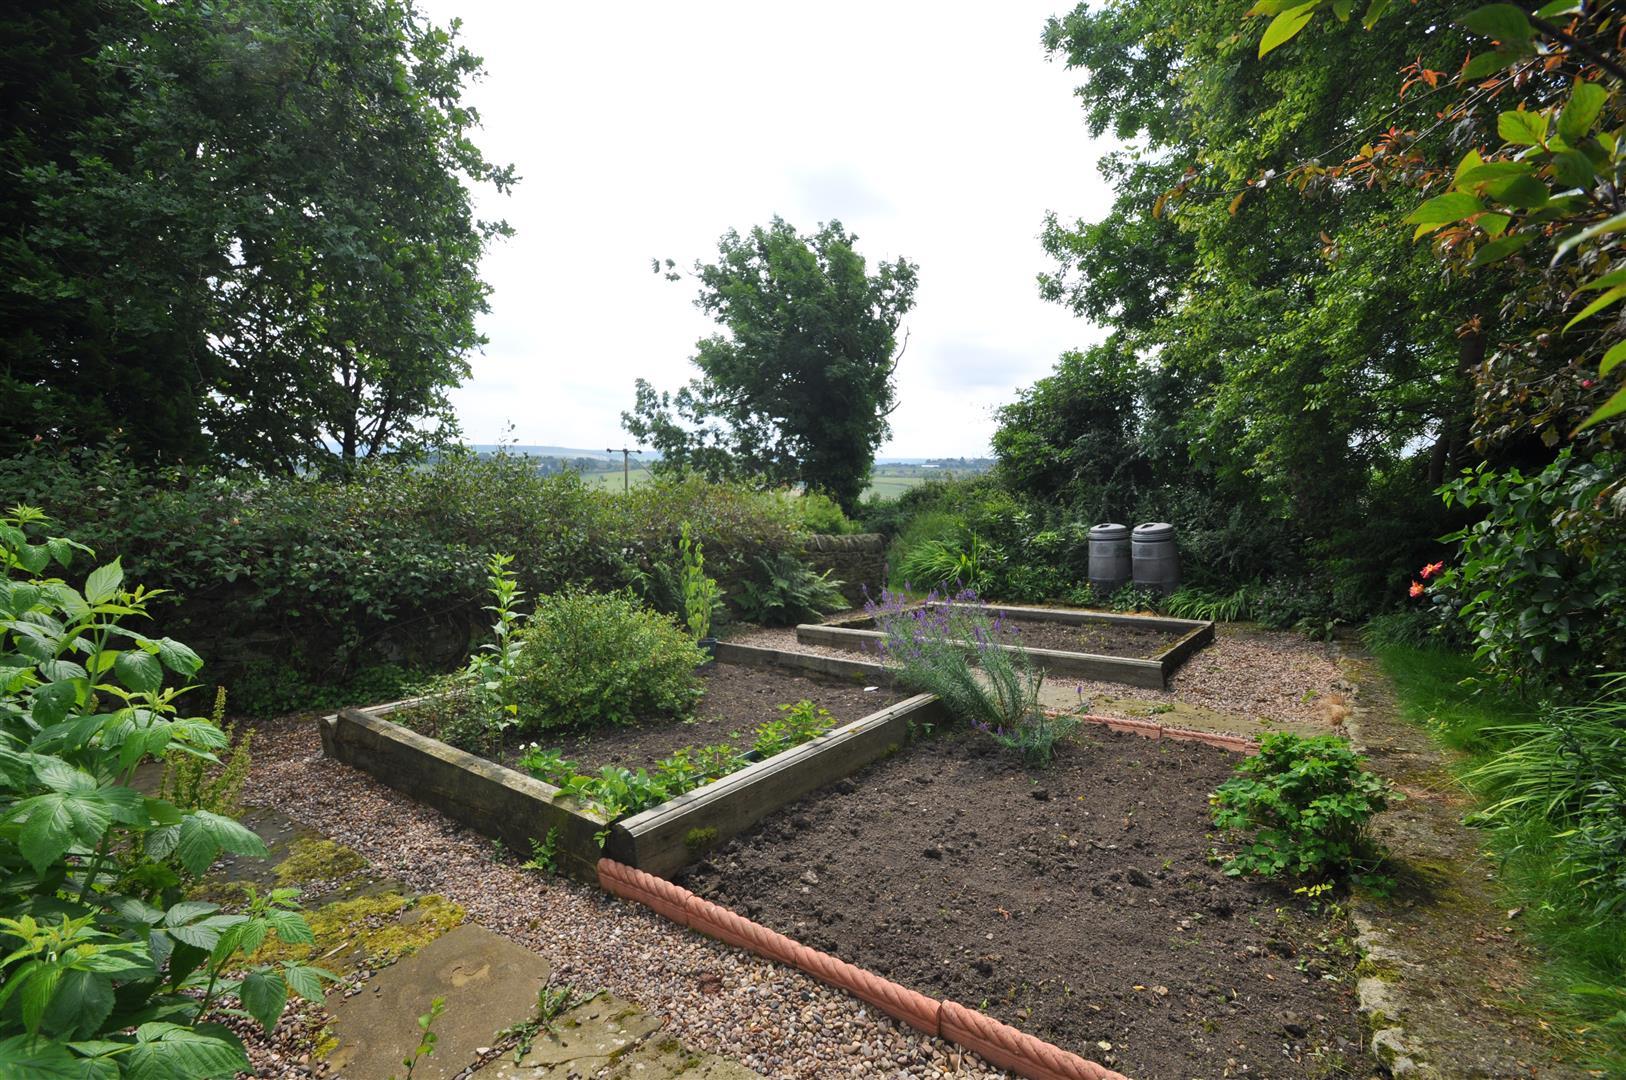 Gig Farm, Eccles Parlour, Soyland, HX6 4NP